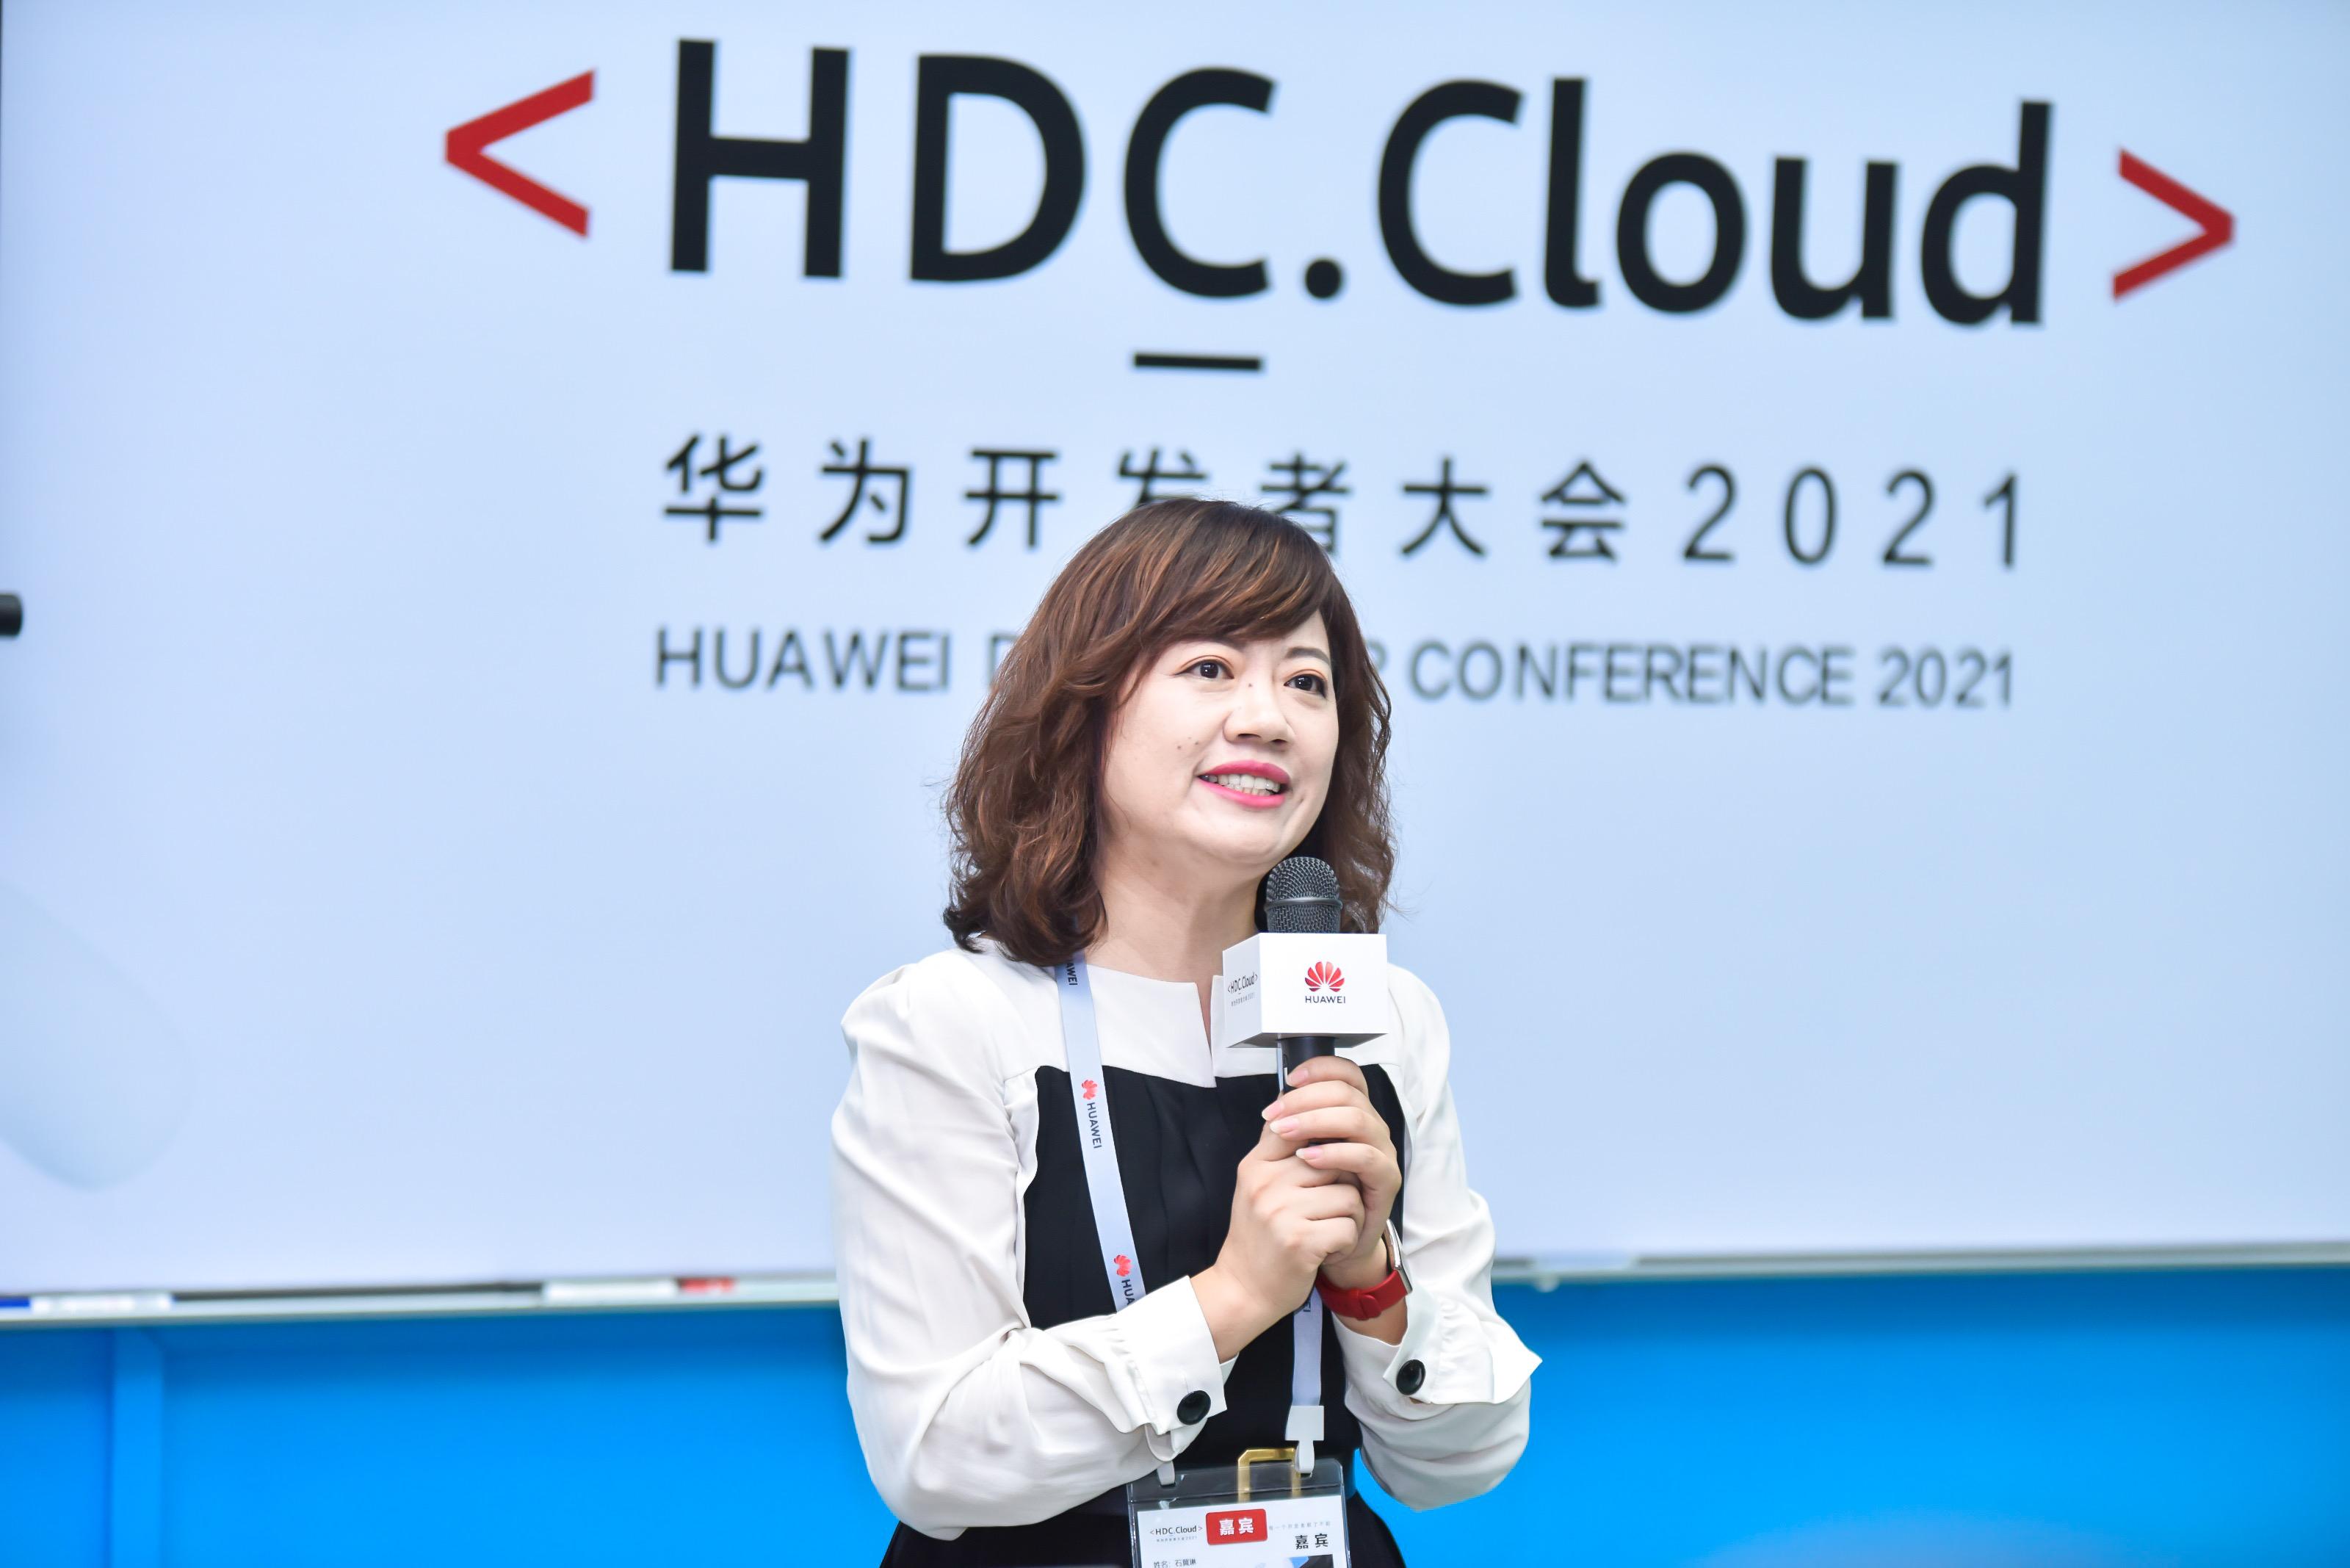 HDC.Cloud首次开设女性开发者论坛,AB亚洲官方直营让女性开发者发挥不一样的创造力